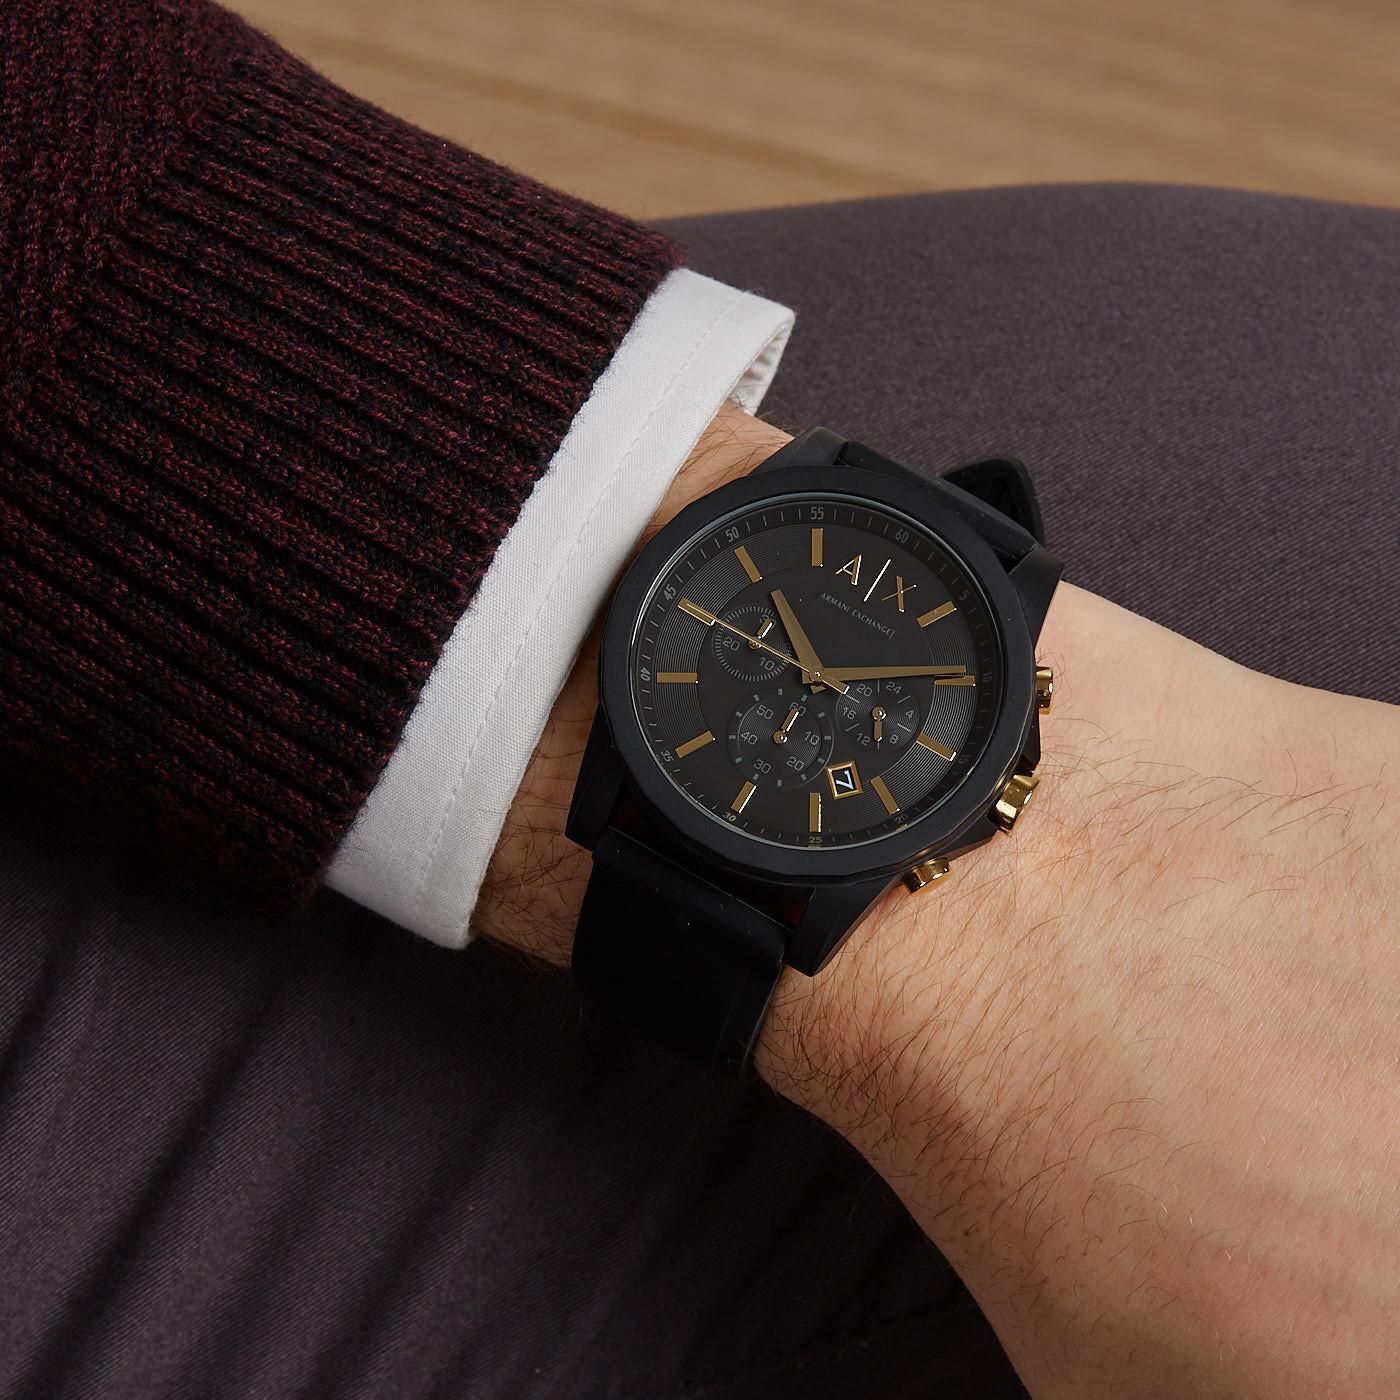 8c1b2ea45889 Armani Exchange reloj AX7105 - Relojes